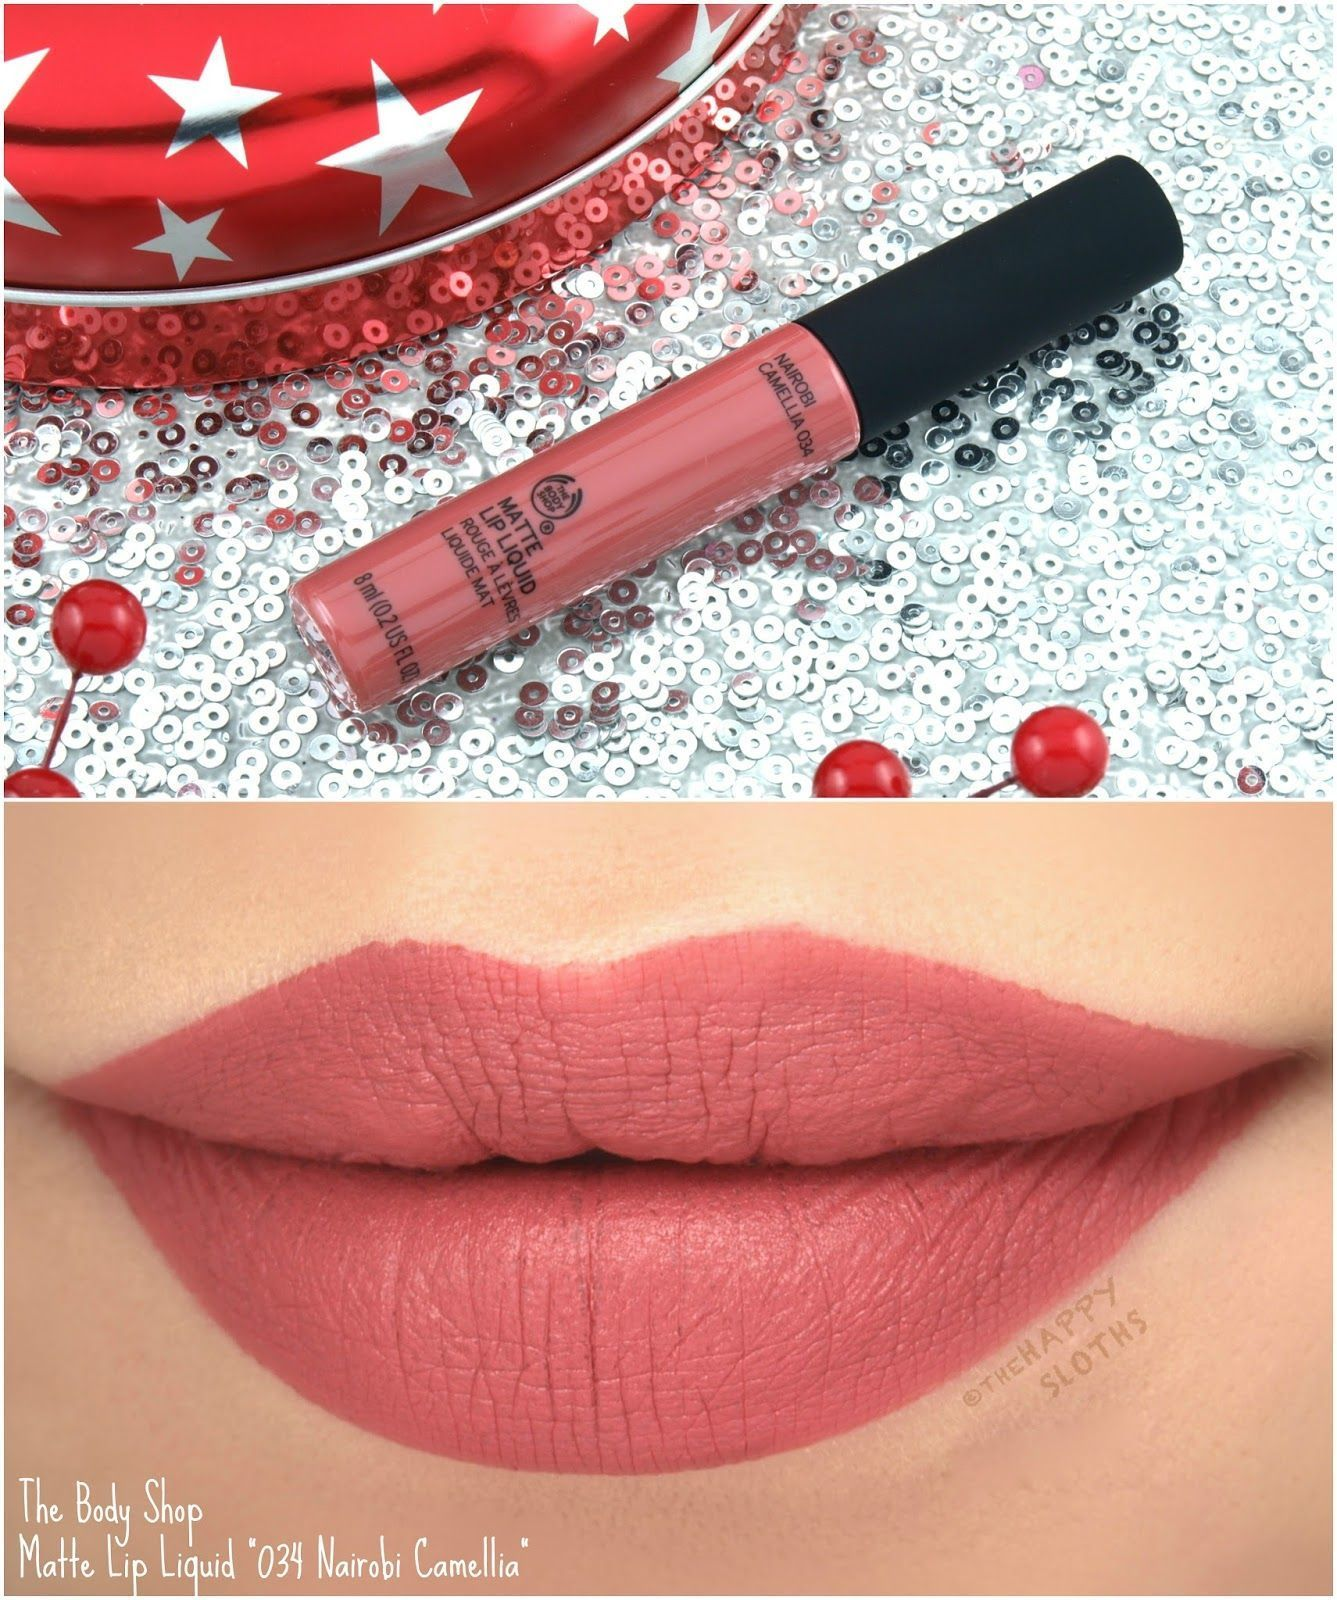 "The Body Shop Matte Lip Liquid in ""034 Nairobi Camellia"